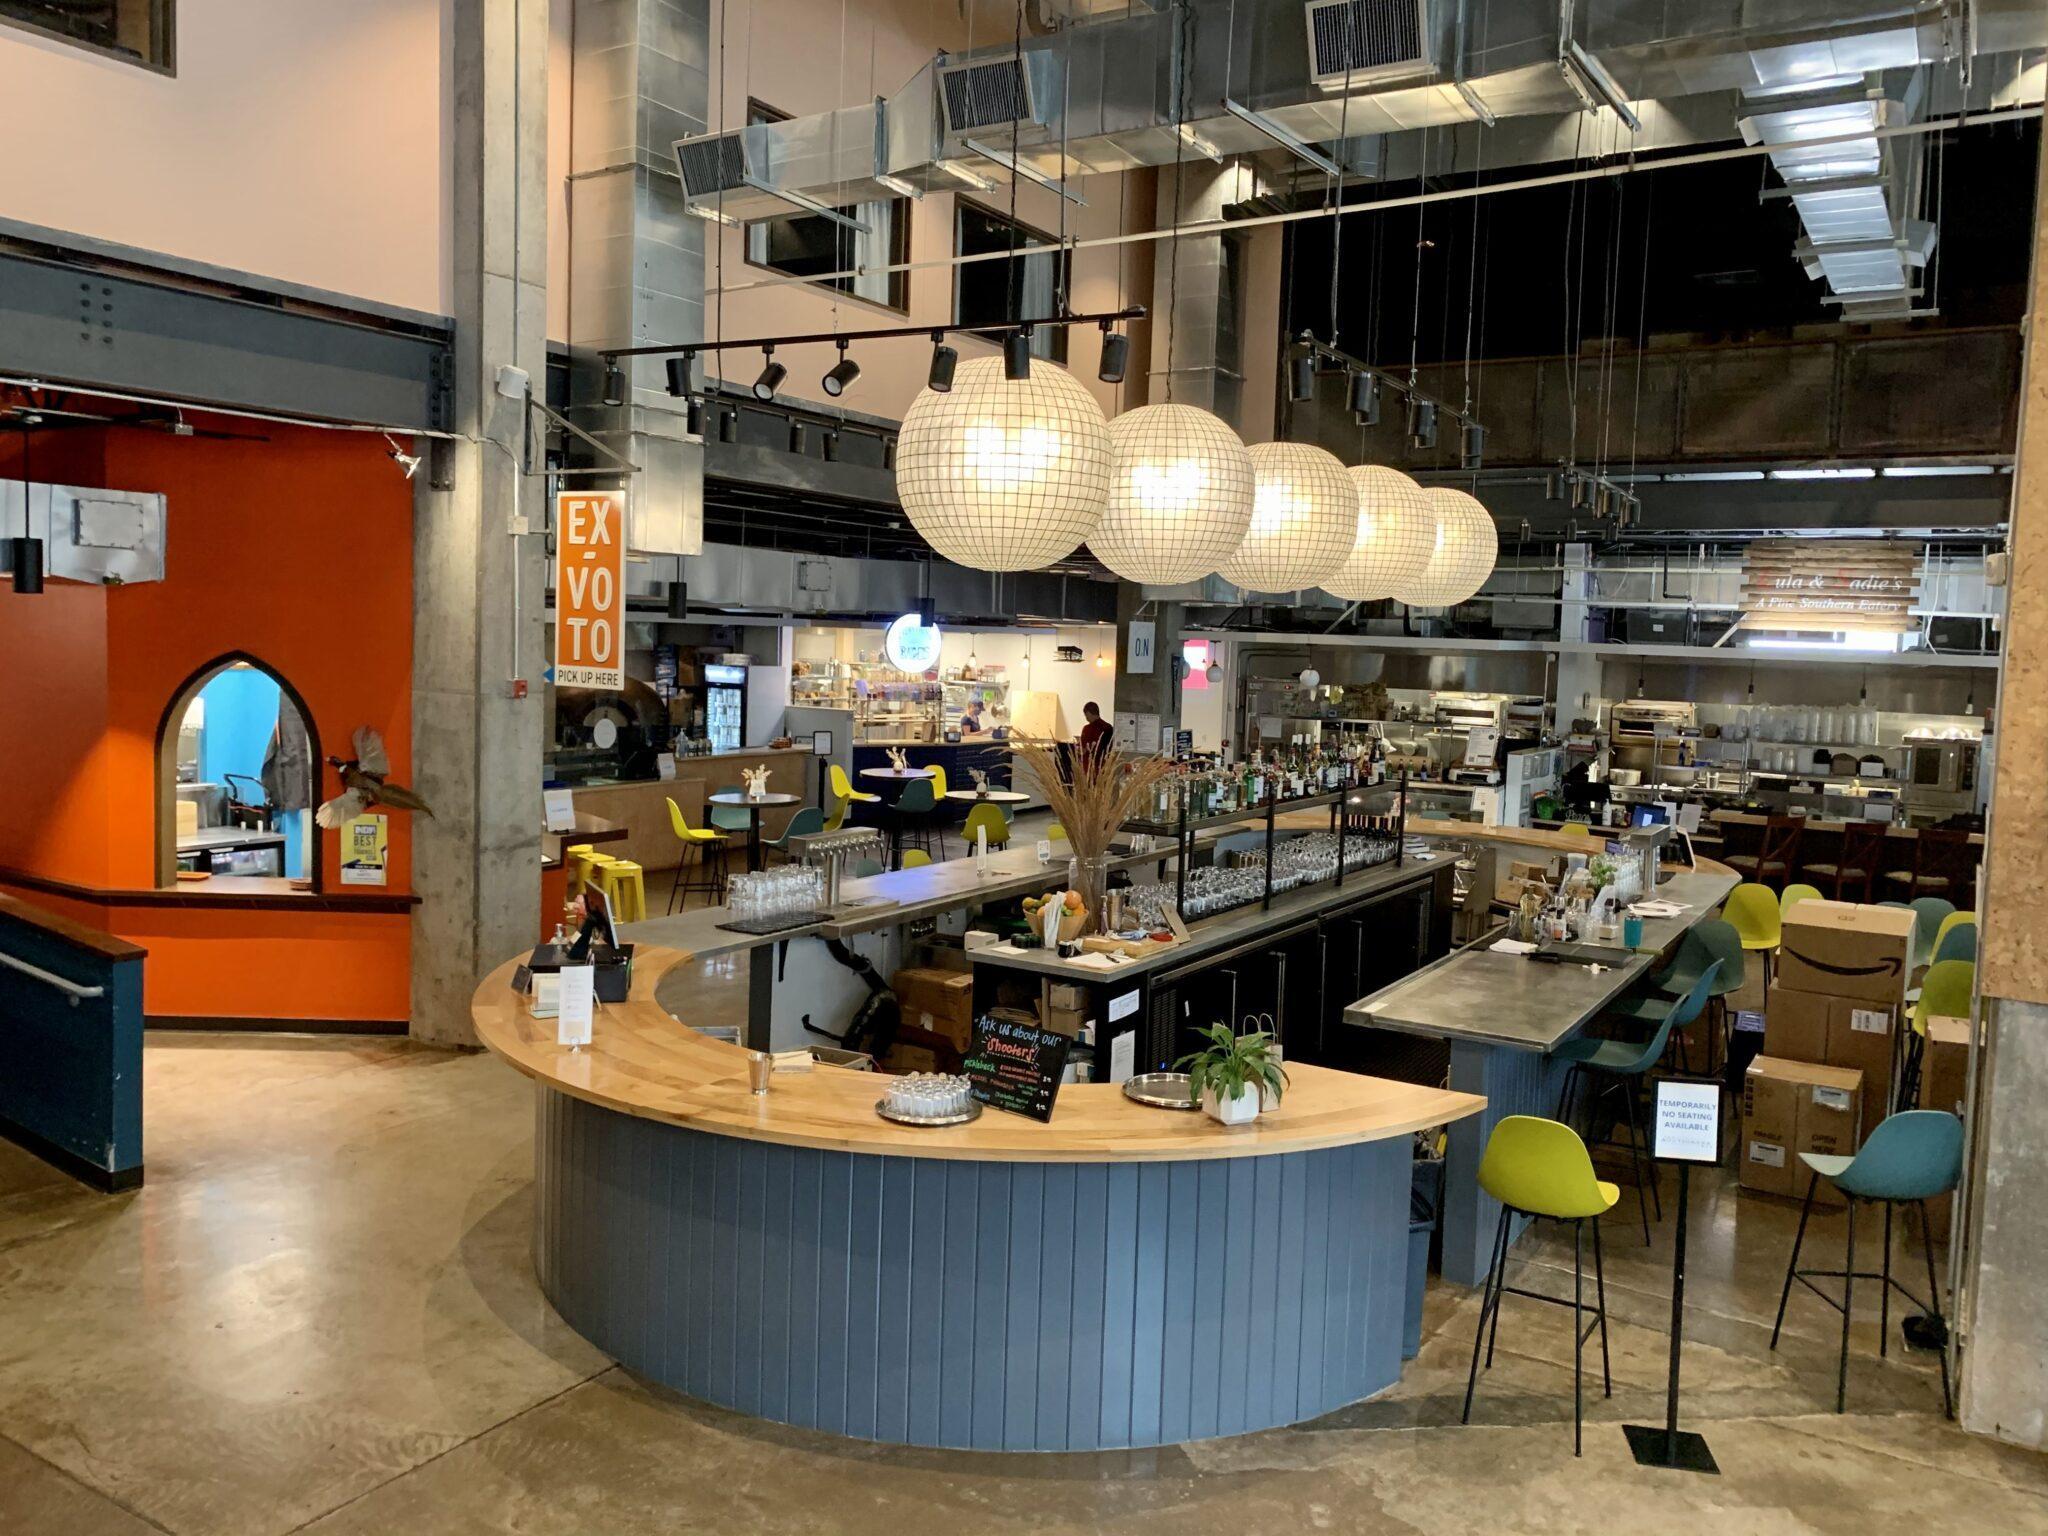 Colorful indoor food vendor space